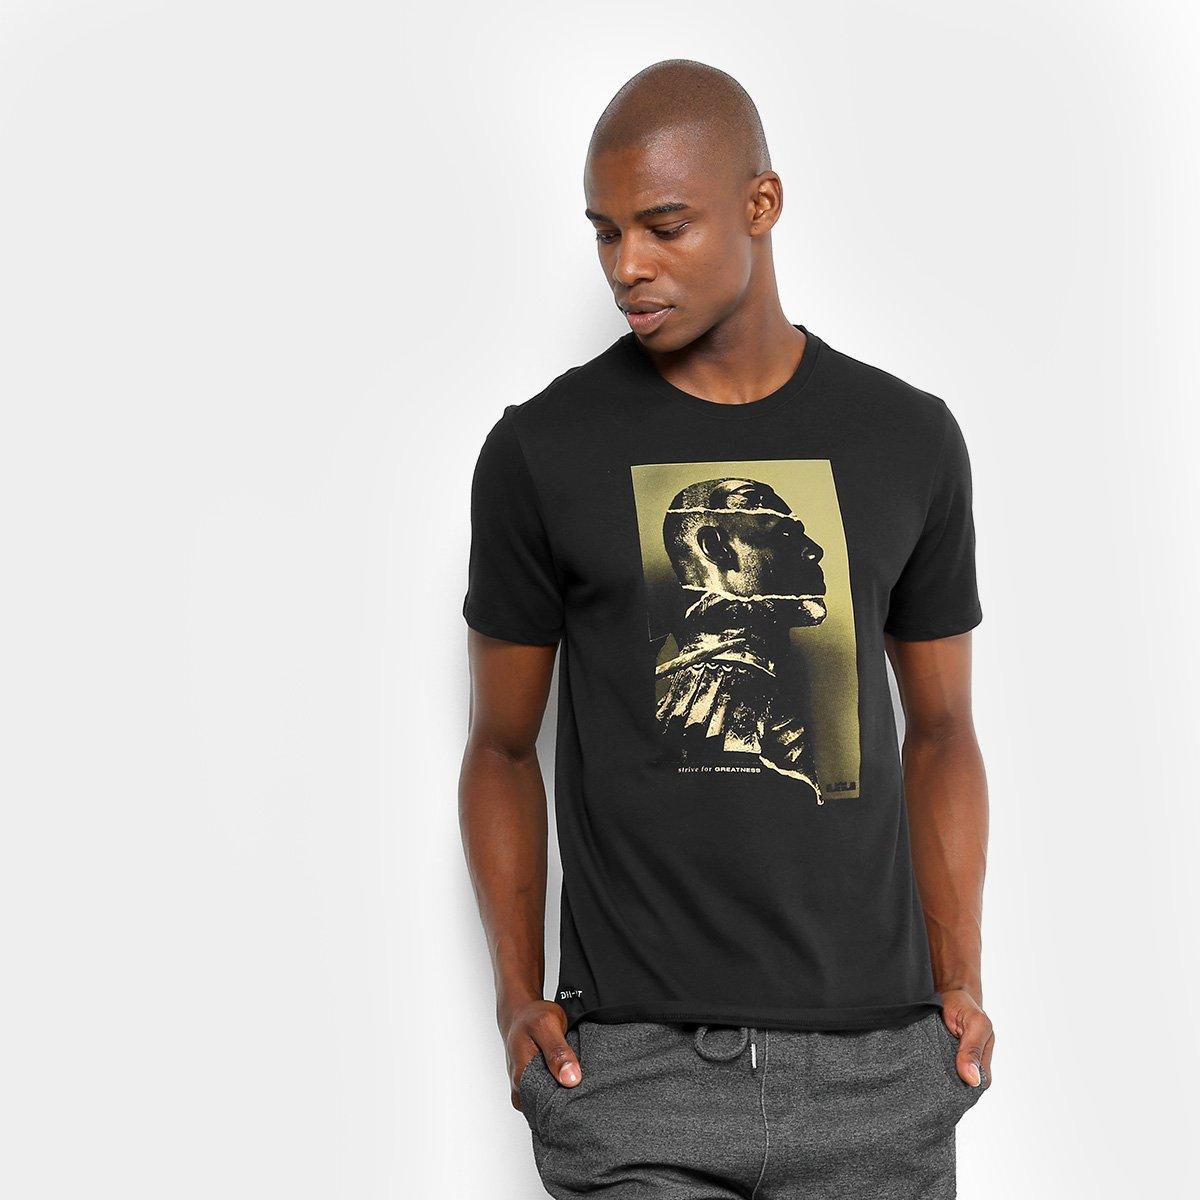 9b966e90ea Camiseta NBA Lebron James Nike Dry Leader Masculina - Preto - Compre ...